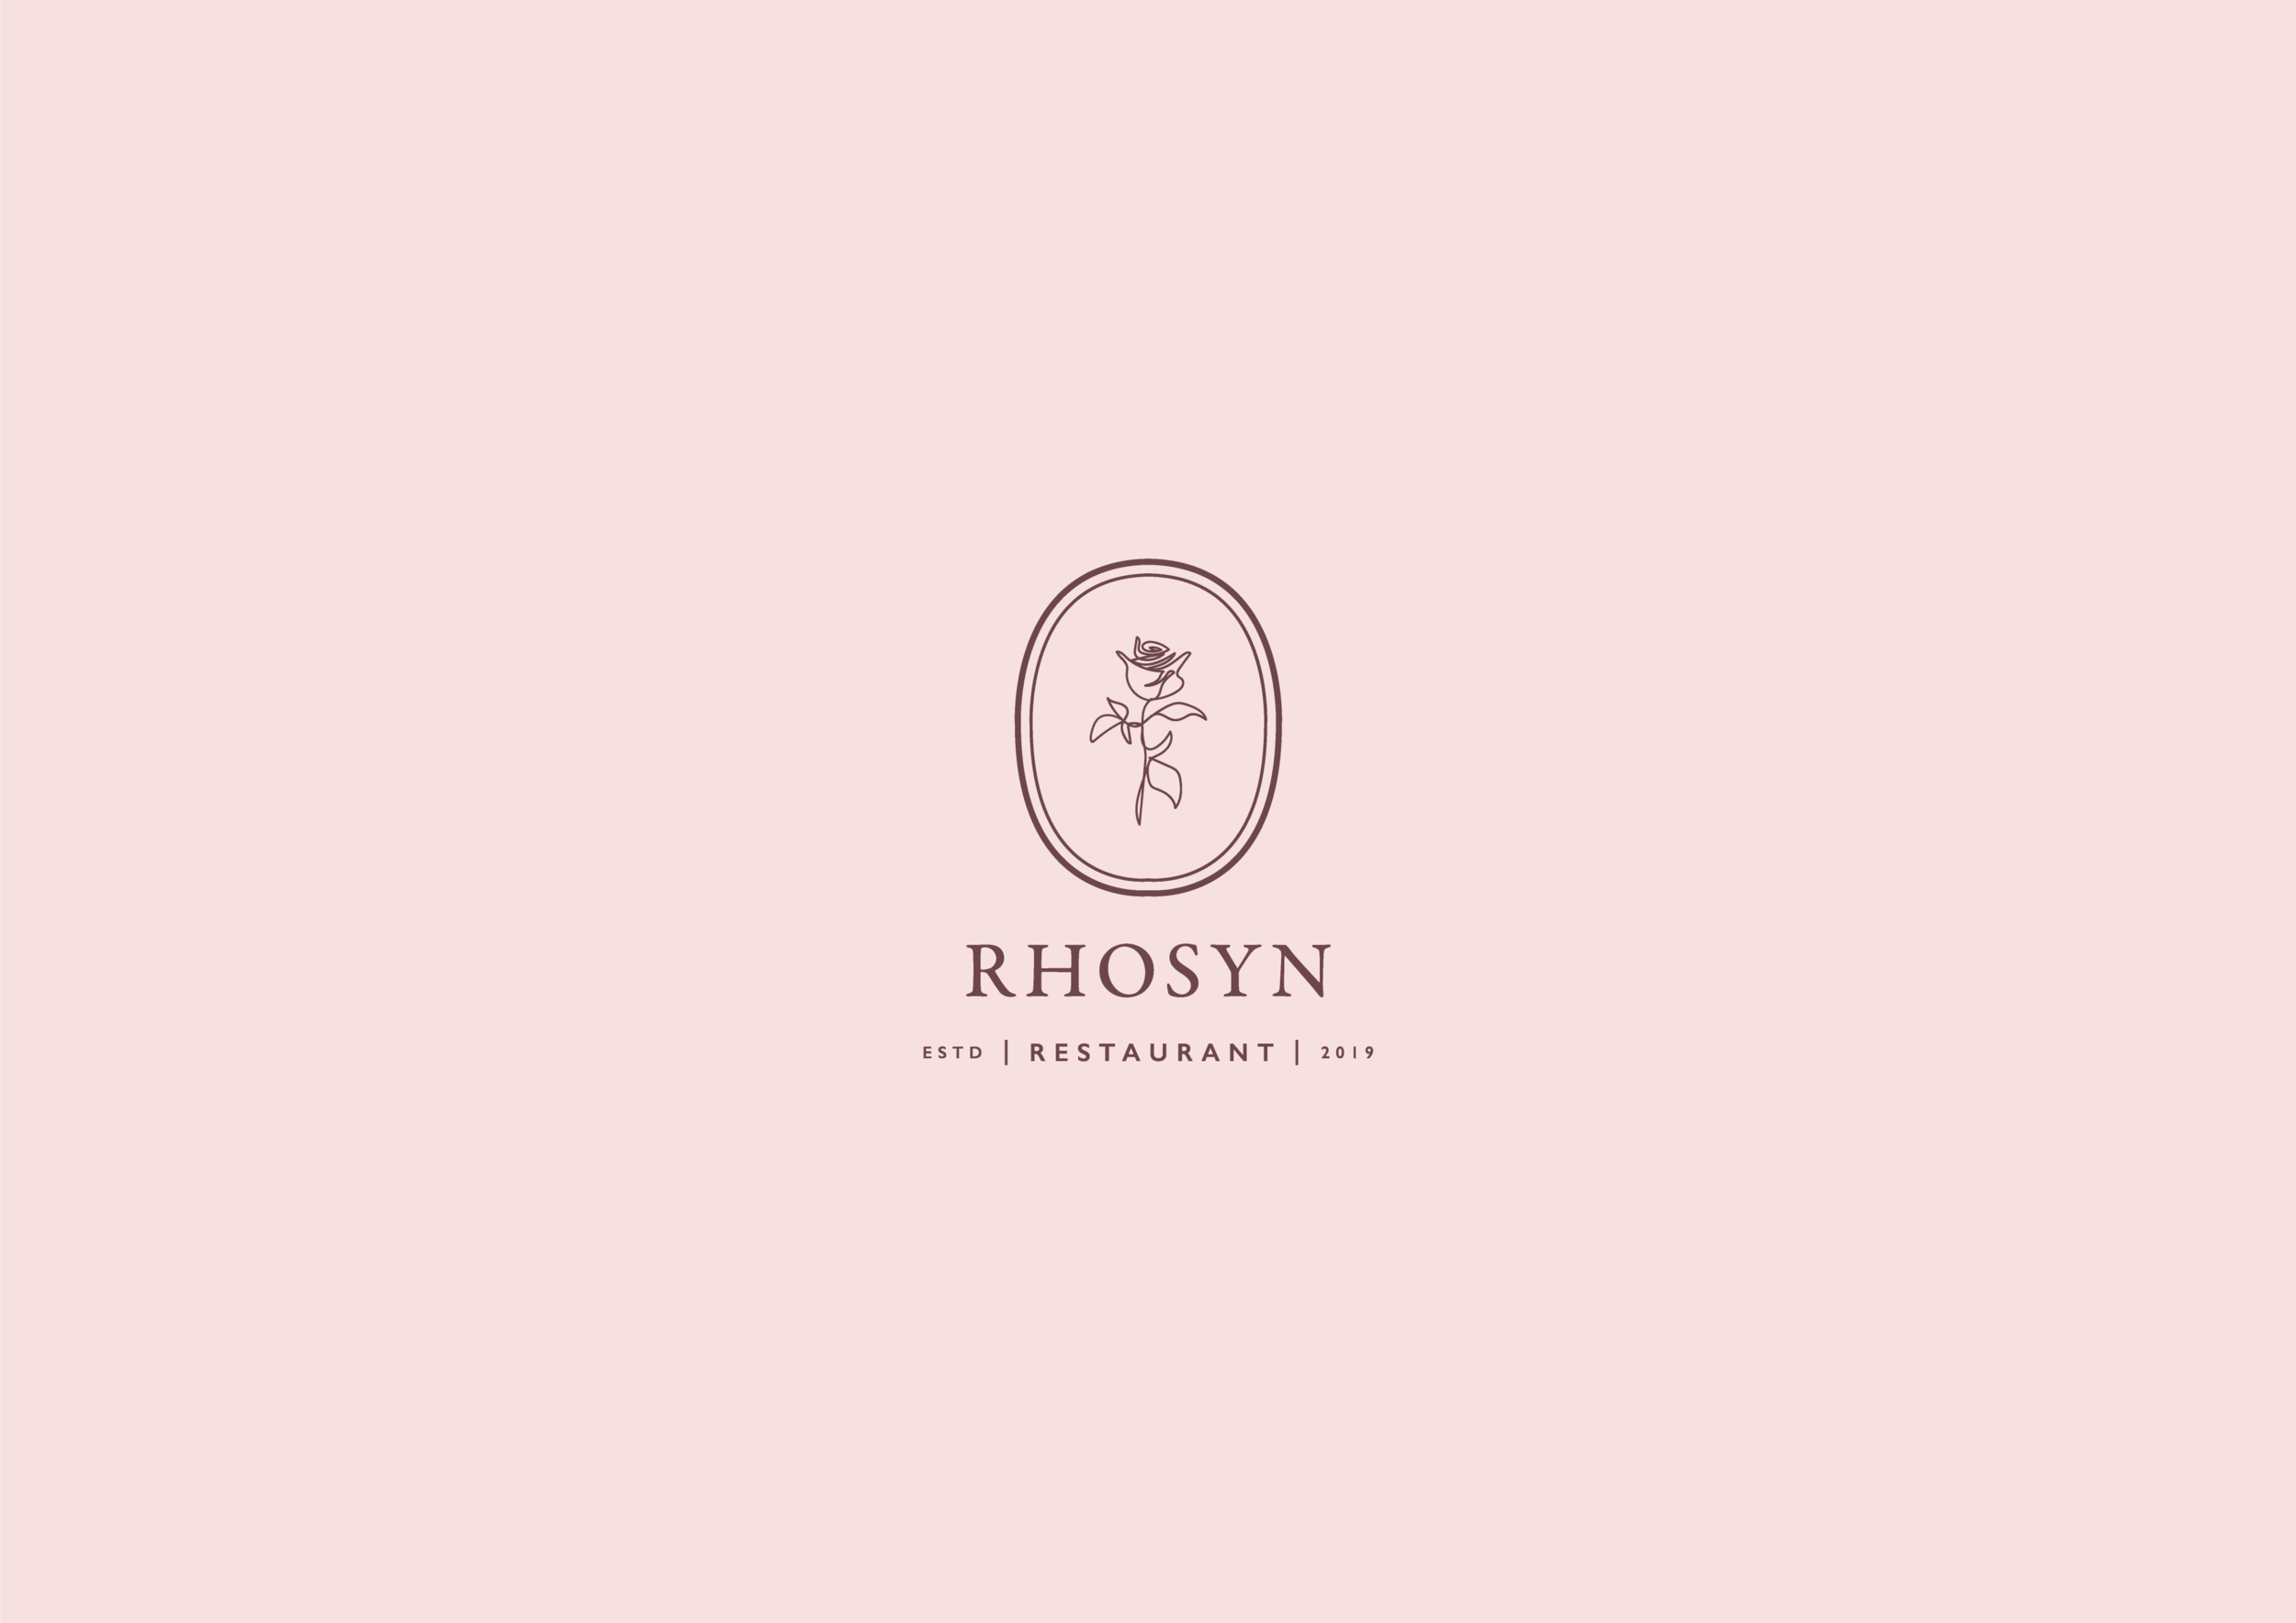 Rhoysn-logo.png